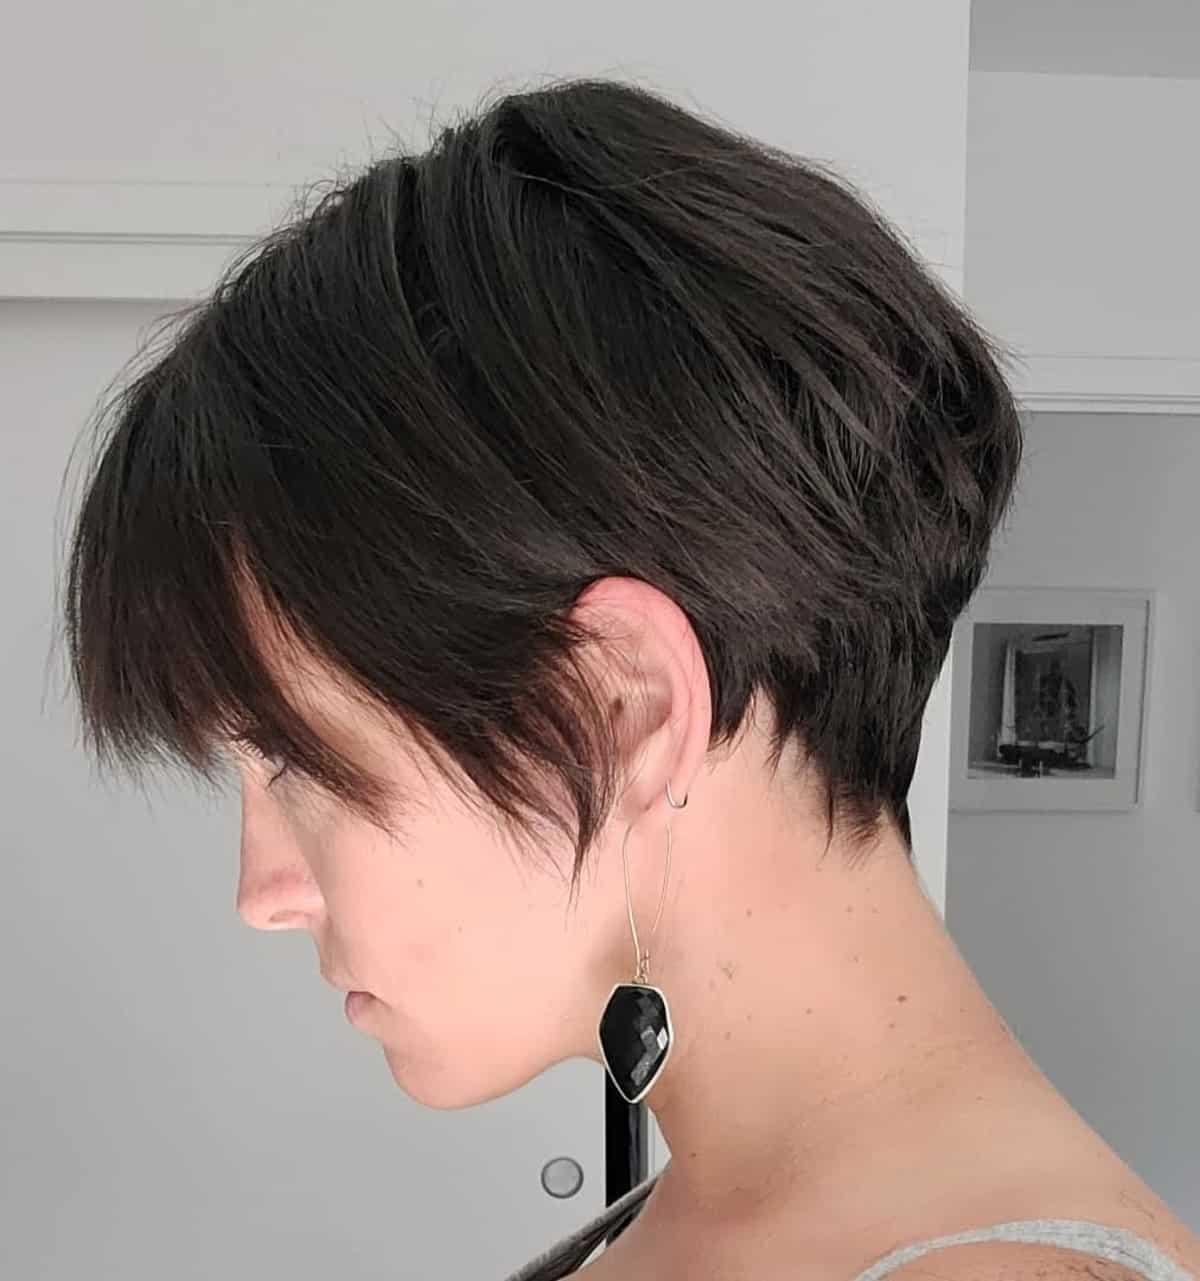 Duendecillo afeitado corto con quemaduras laterales